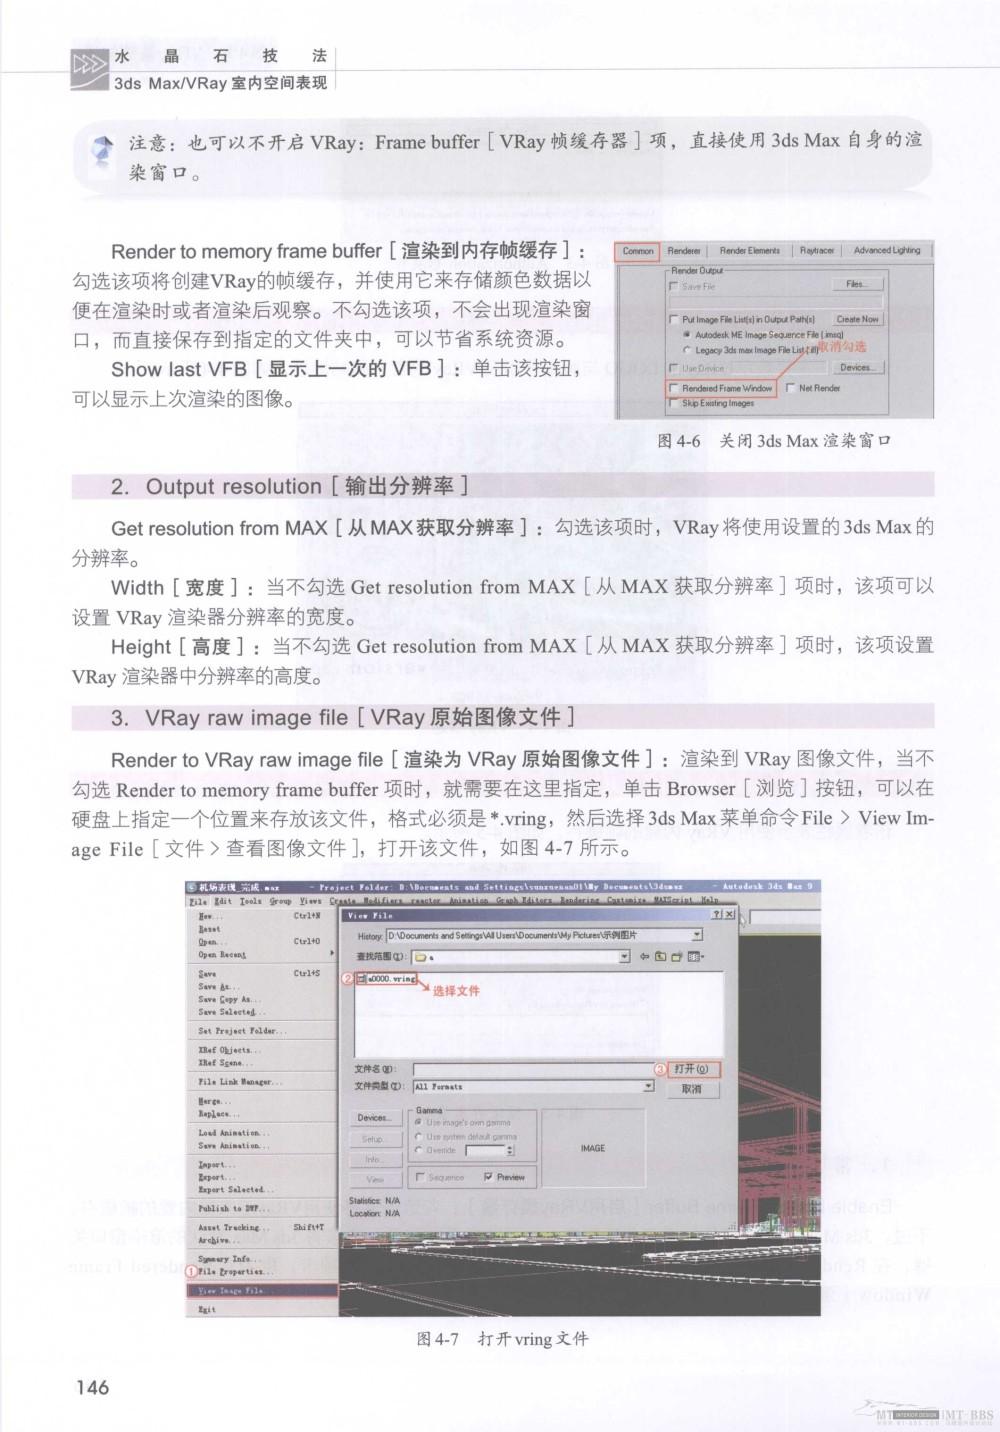 水晶石技法-3ds_Max&VRay室内空间表现_水晶石技法-3ds_Max&VRay室内空间表现_页面_152.jpg